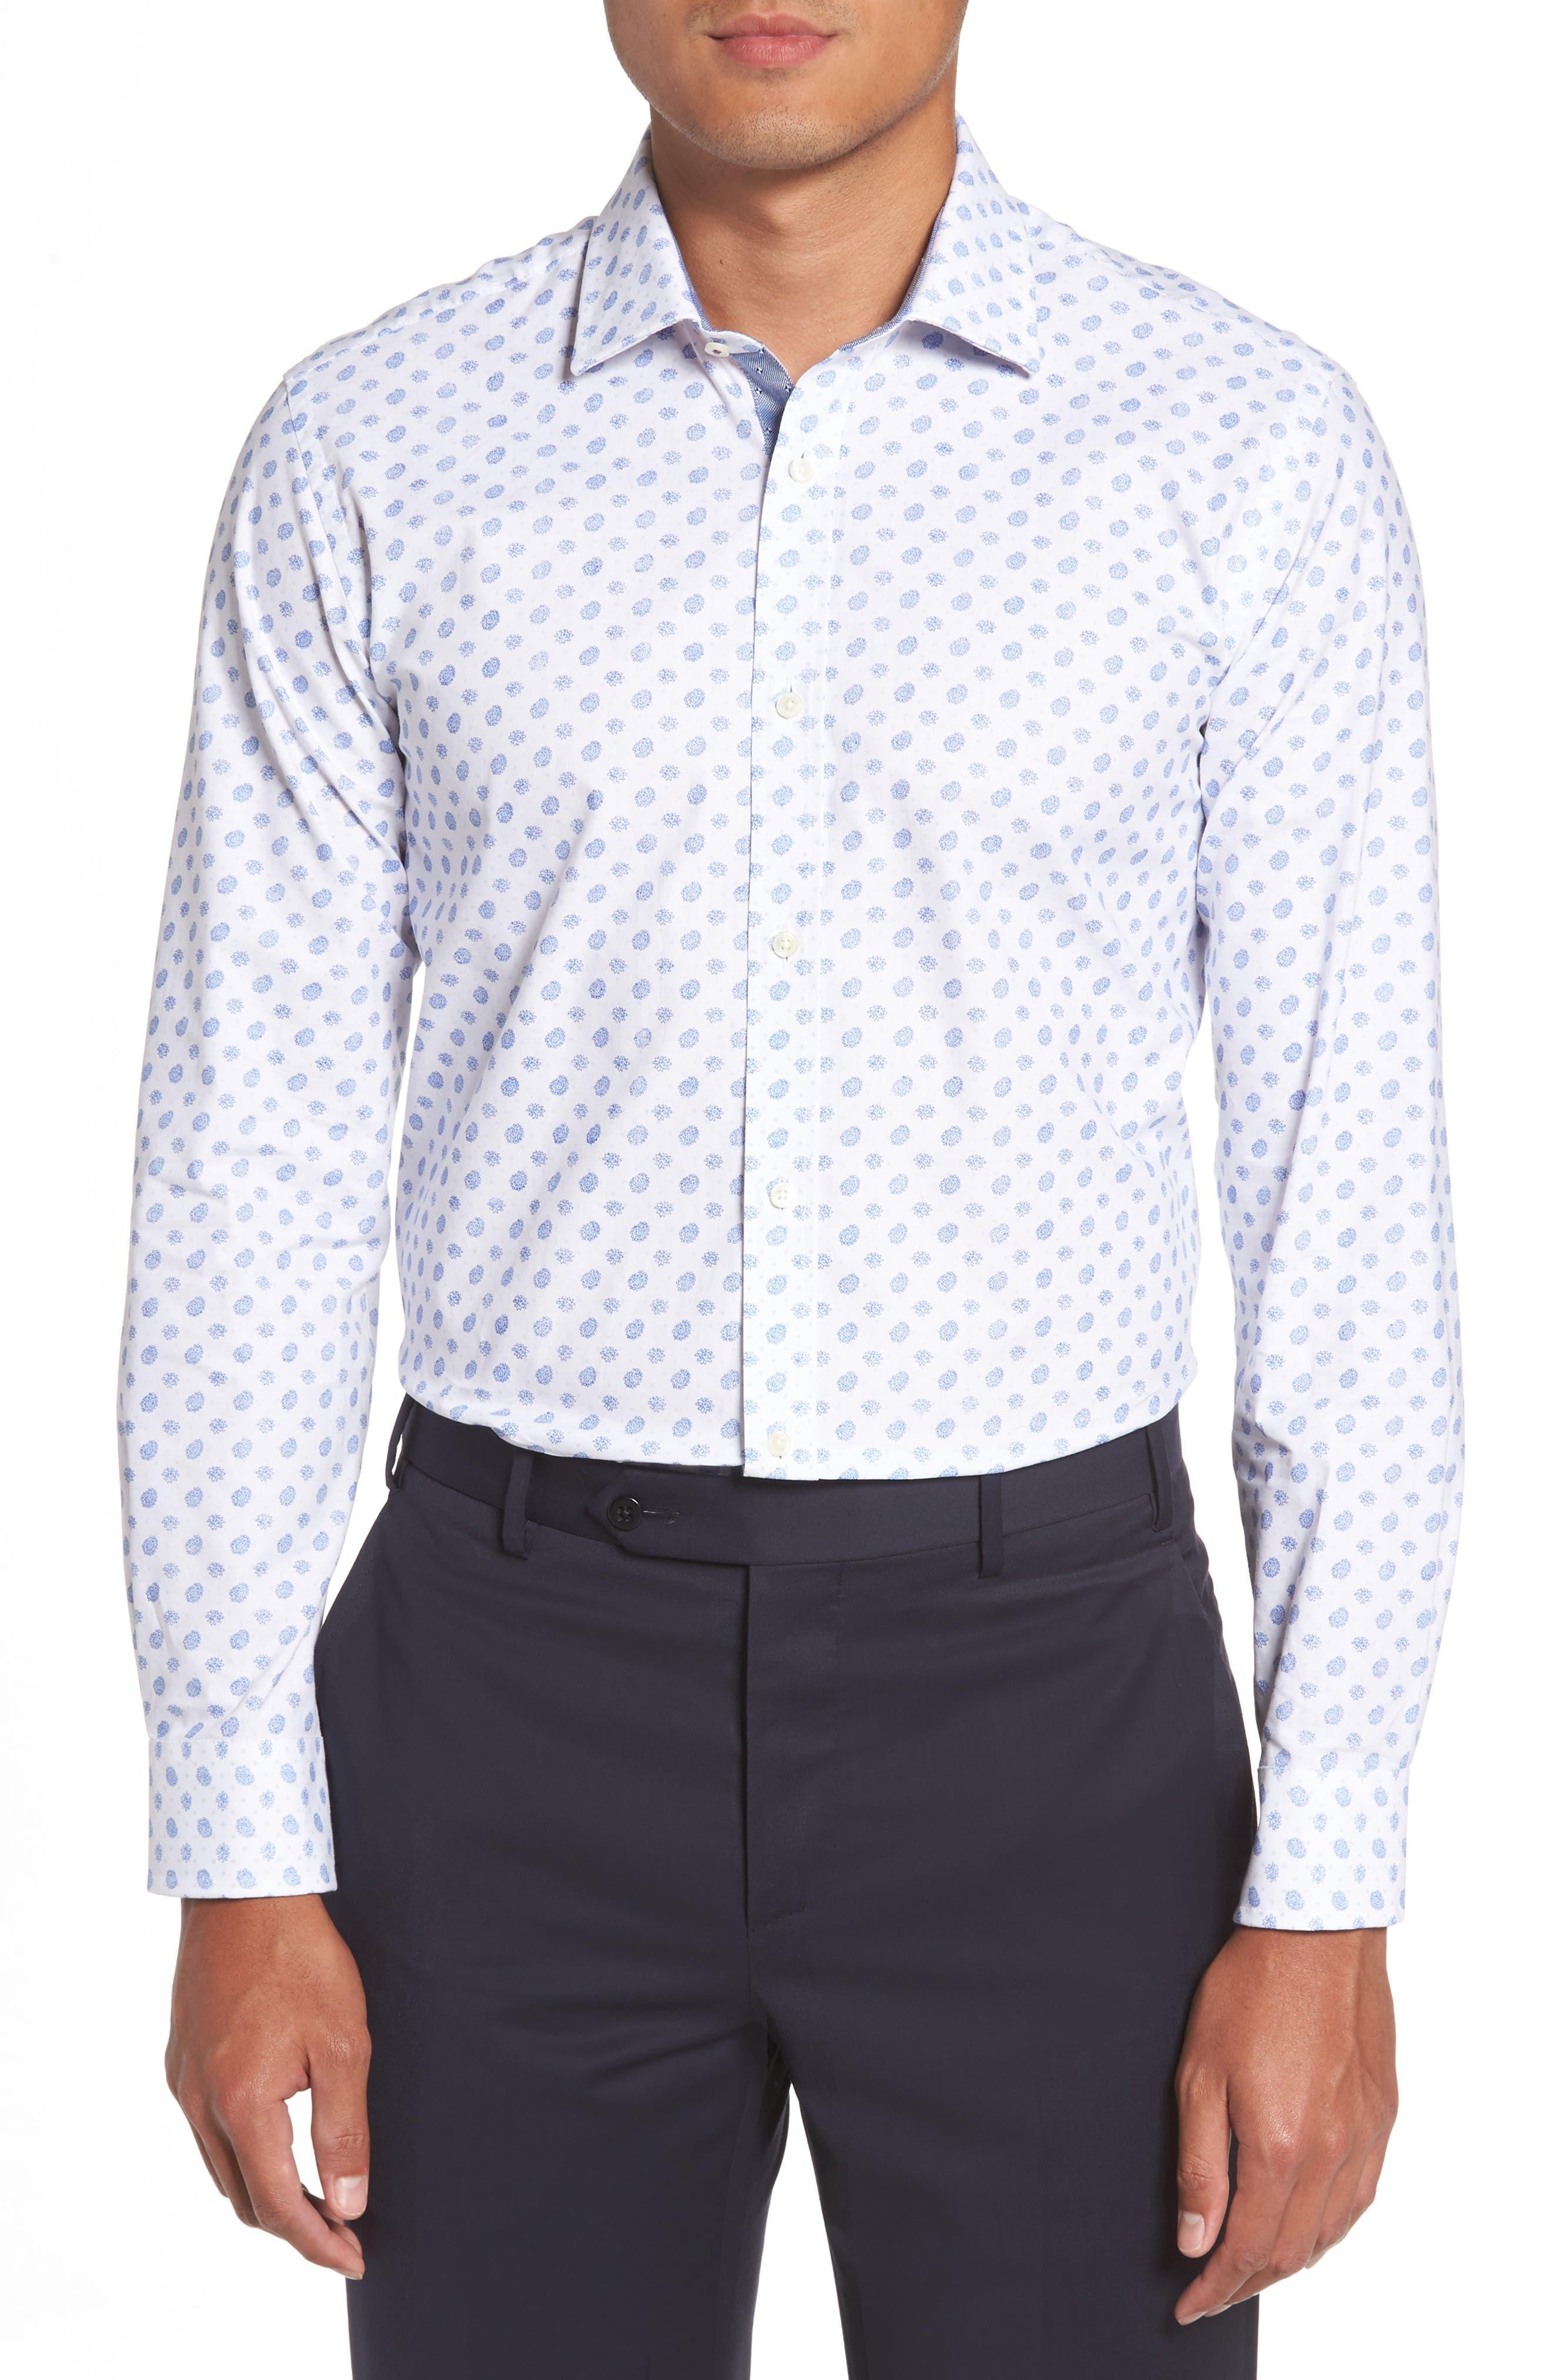 Midra Trim Fit Paisley Dress Shirt,                         Main,                         color, 110